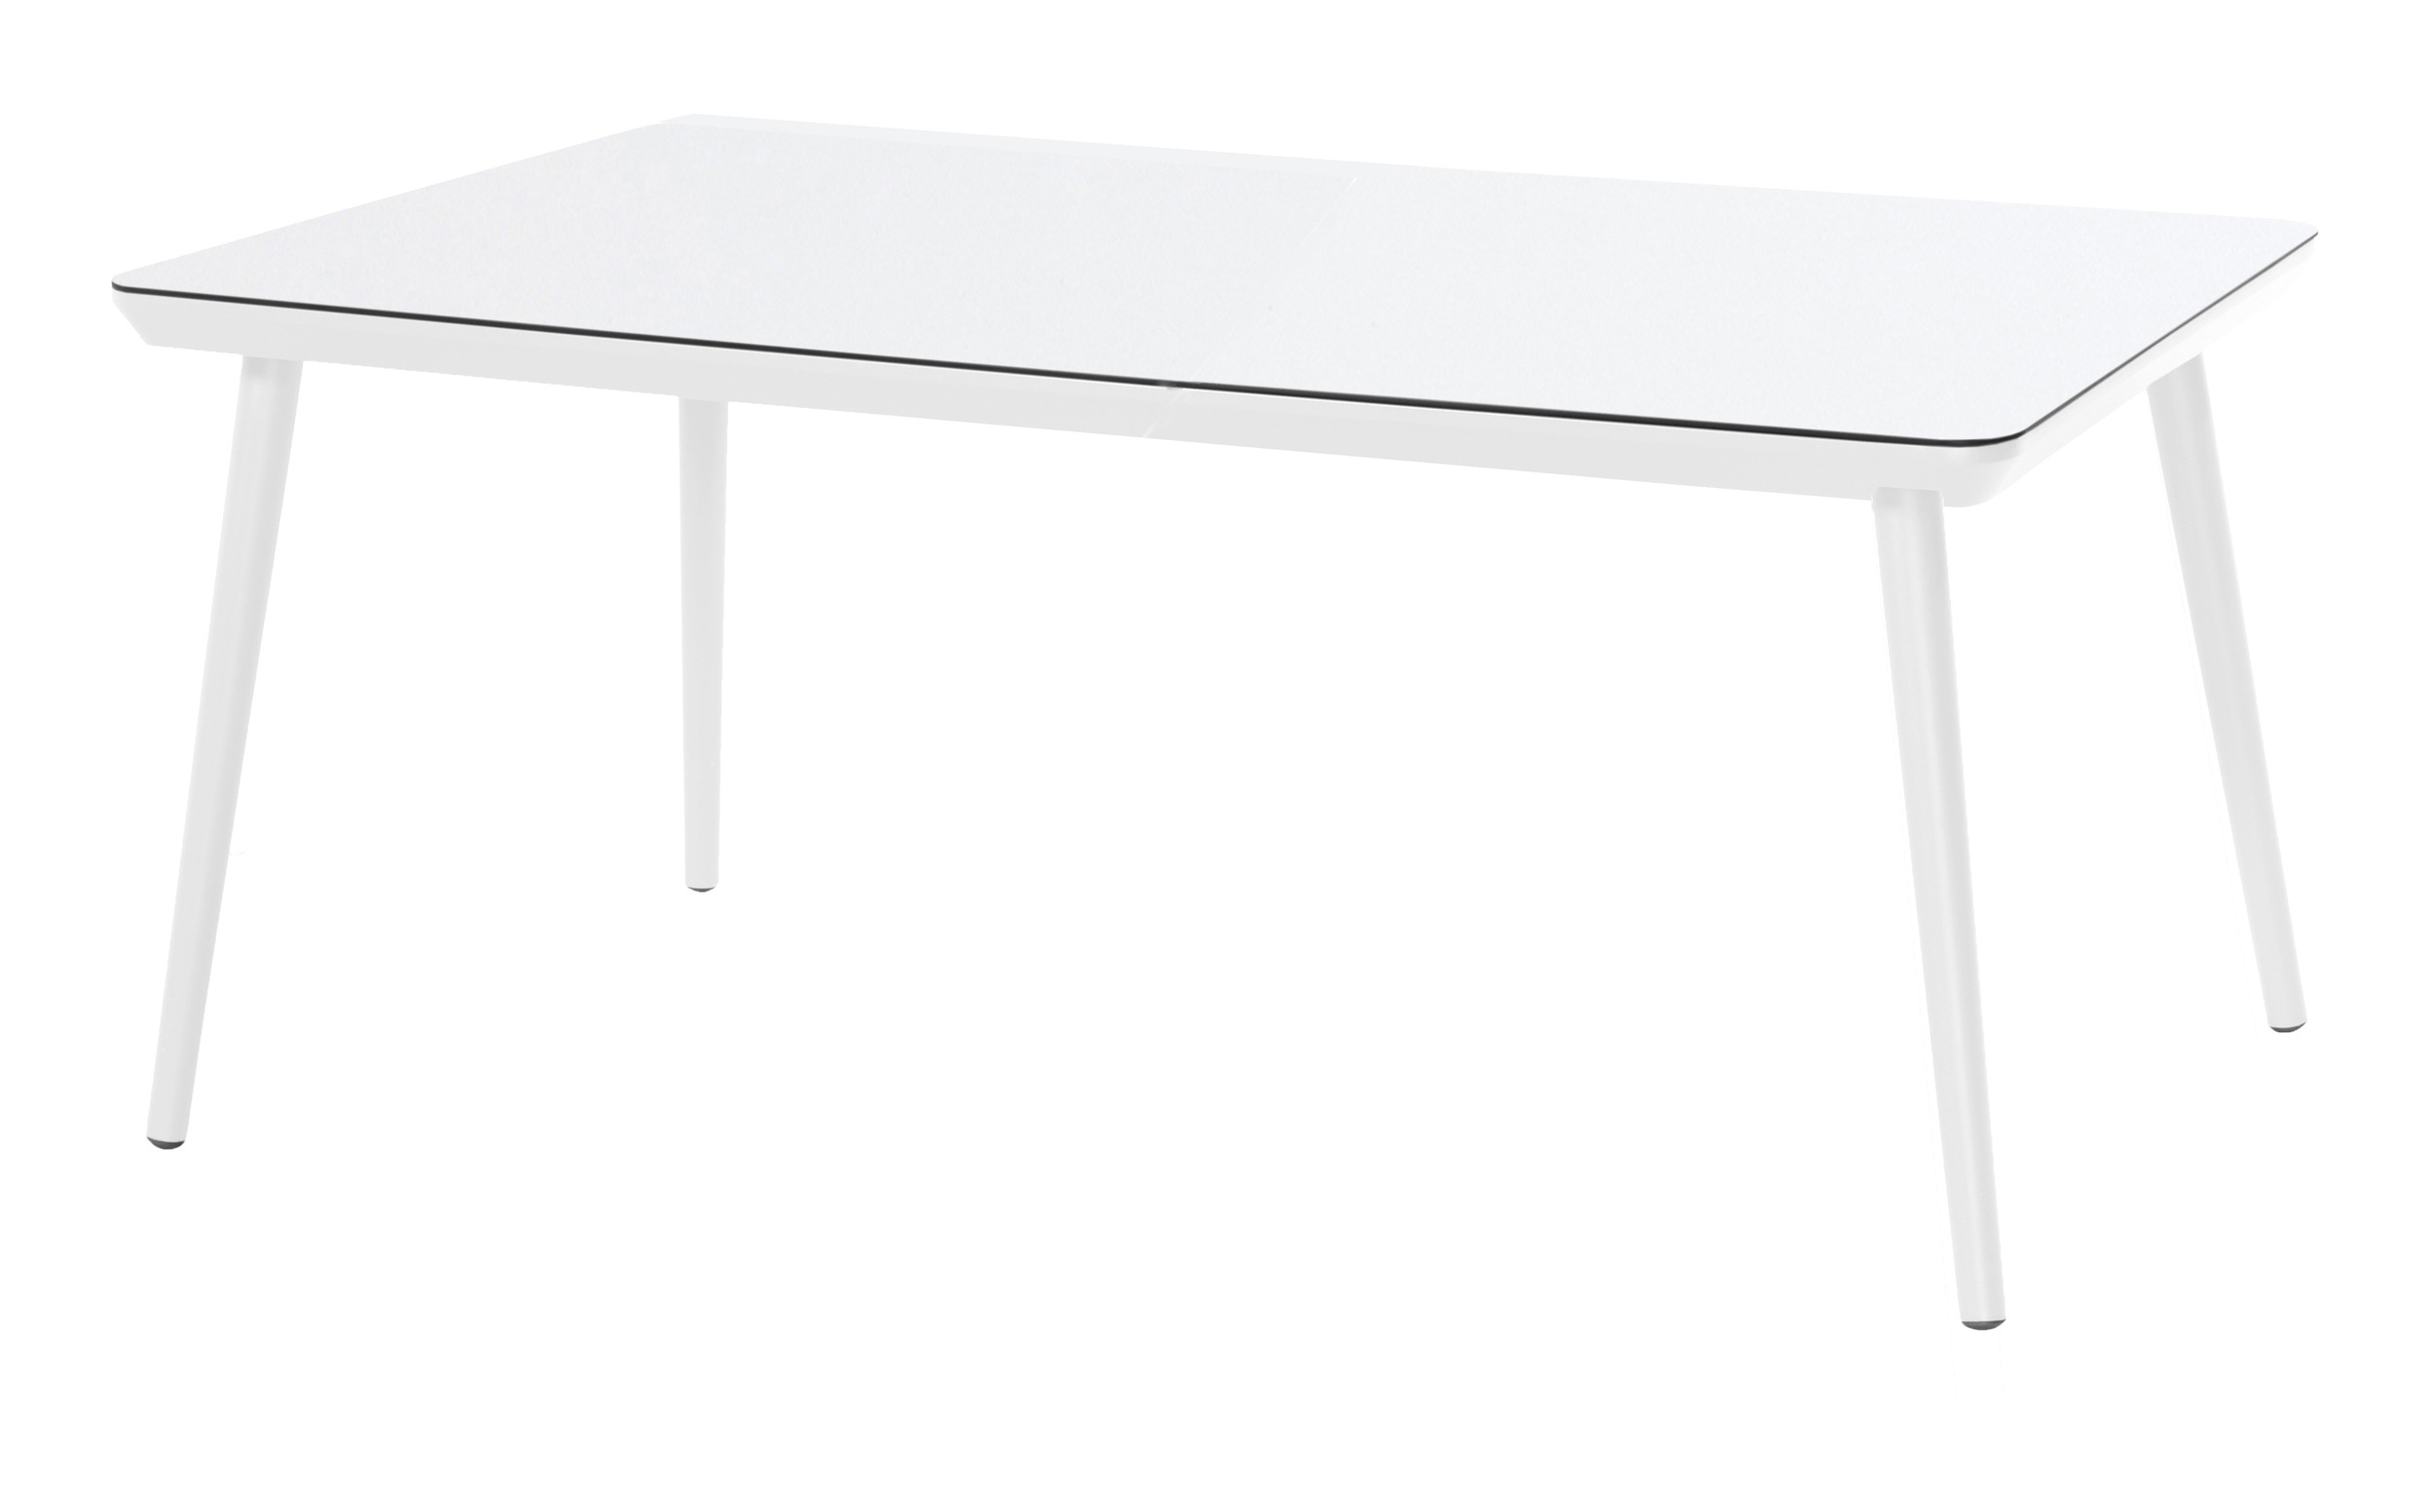 Hartman Tuintafel 'Sophie Studio' HPL, 170 x 100cm, kleur Wit